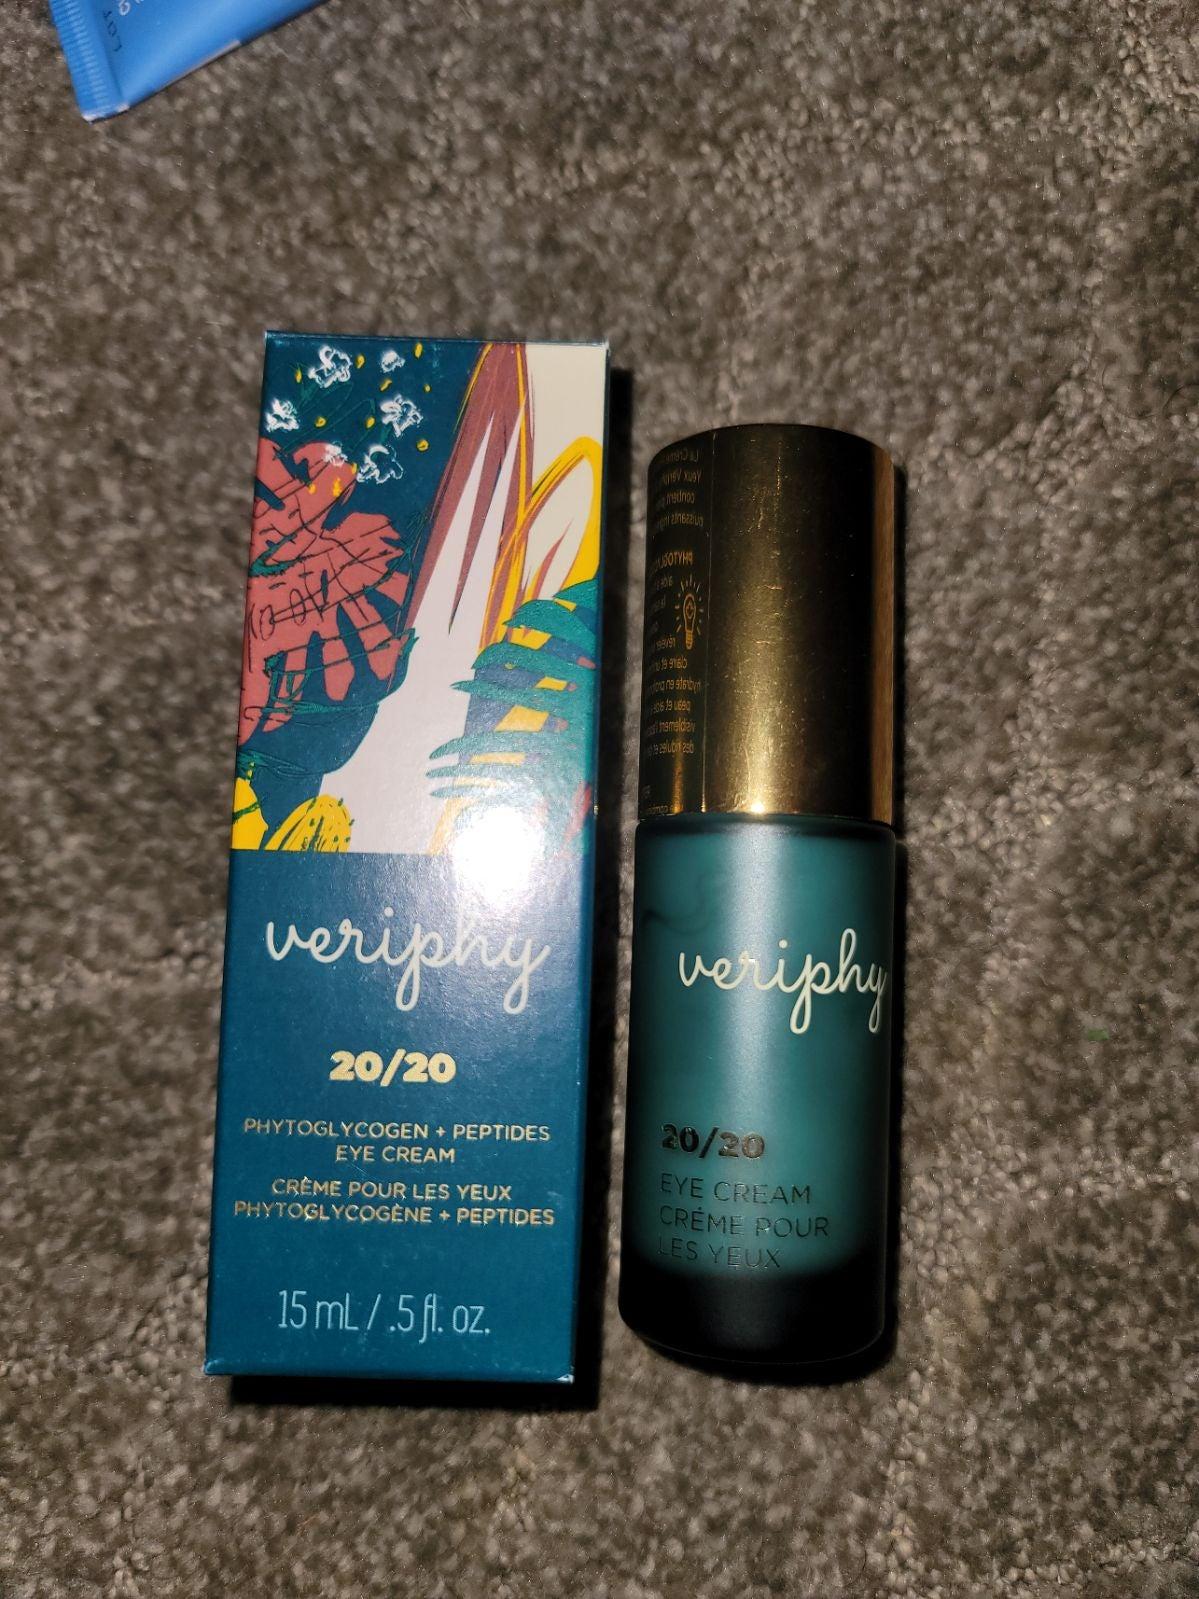 Veriphy eye cream